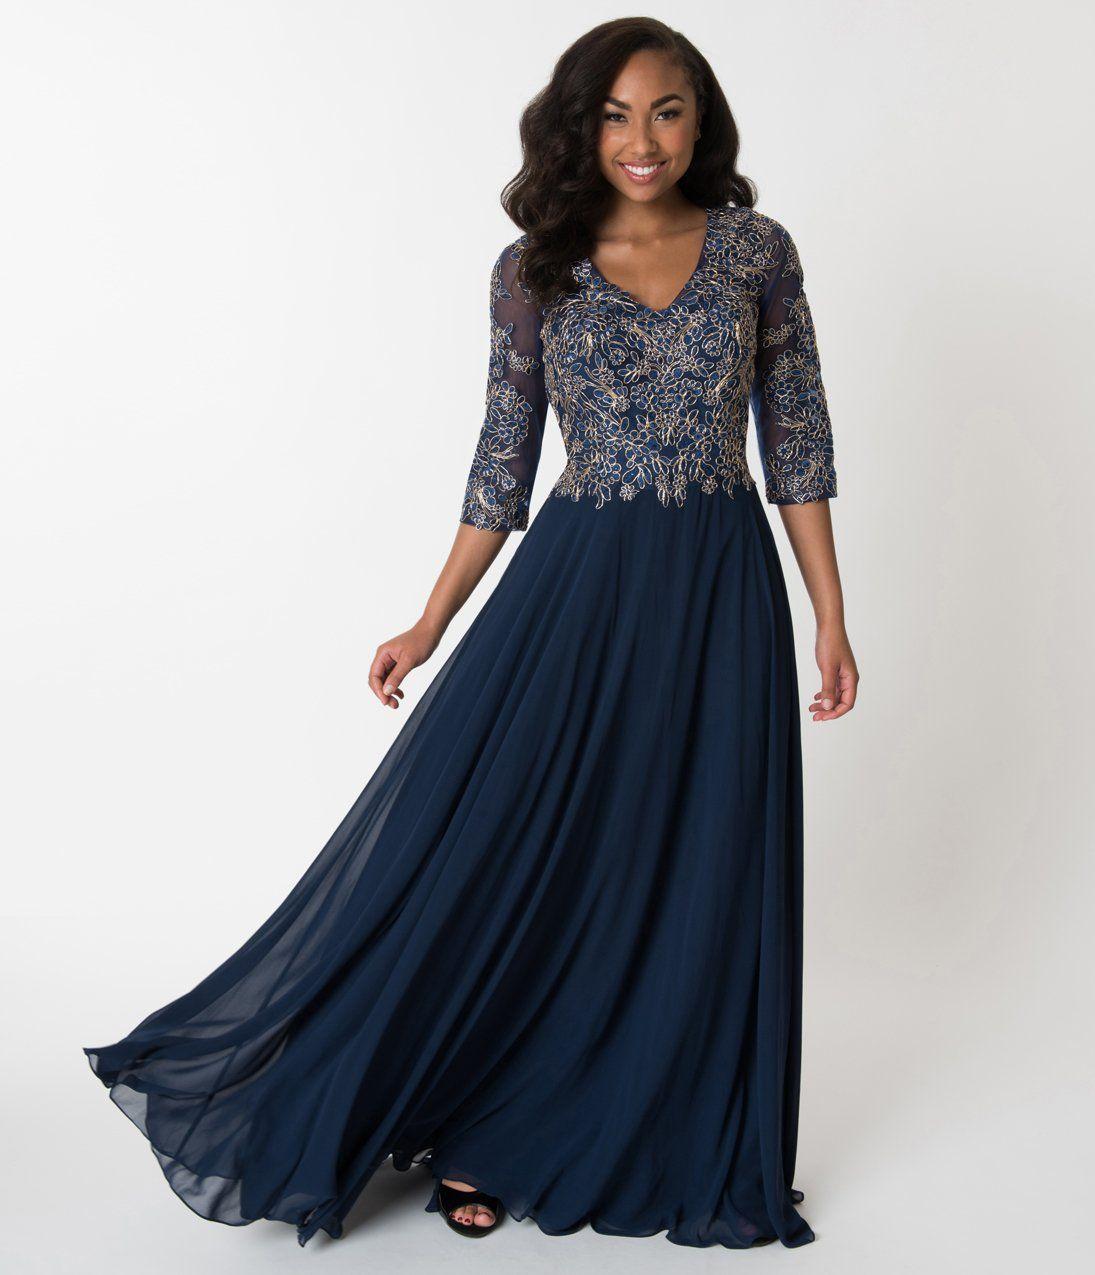 1940s Style Prom Dresses Formal Dresses Evening Gowns Vintage Inspired Dresses Vintage Dresses Vintage Dresses Online [ 1275 x 1095 Pixel ]